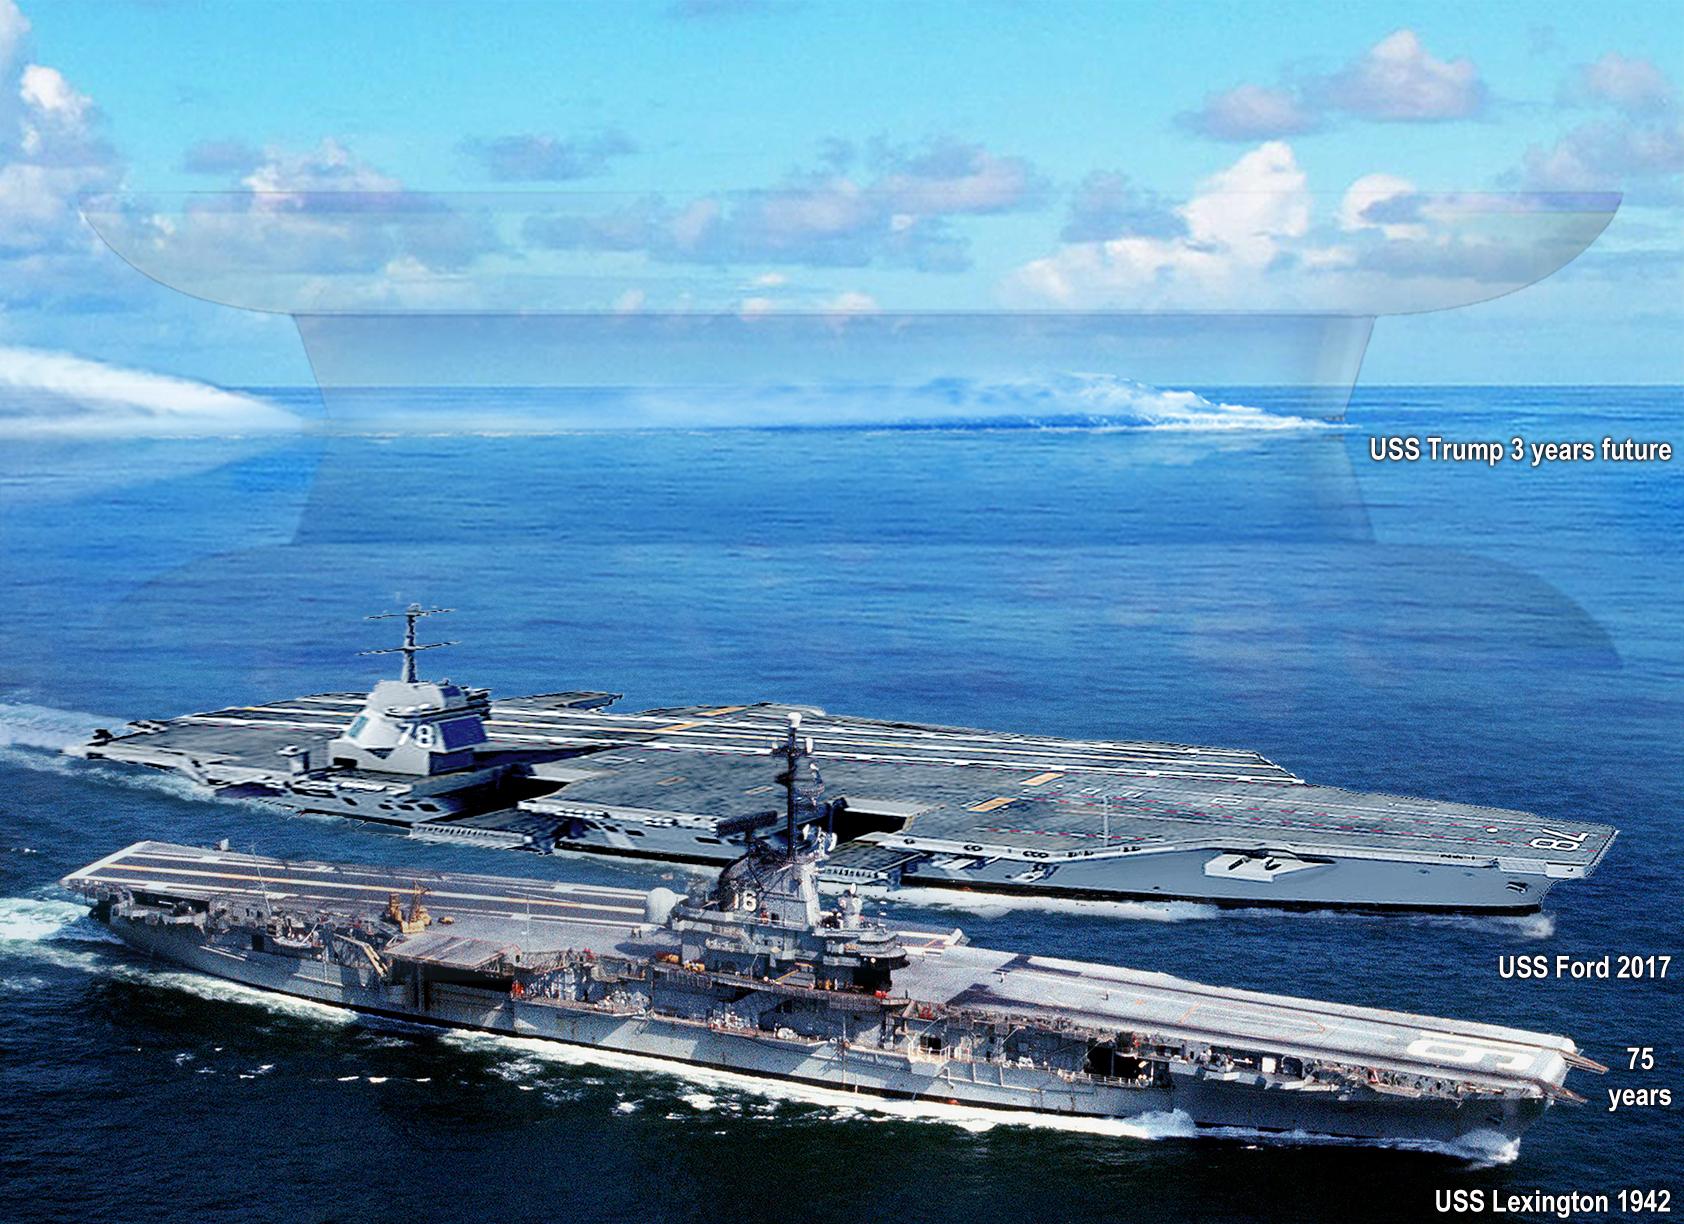 USS_Lexington 23 September 1942